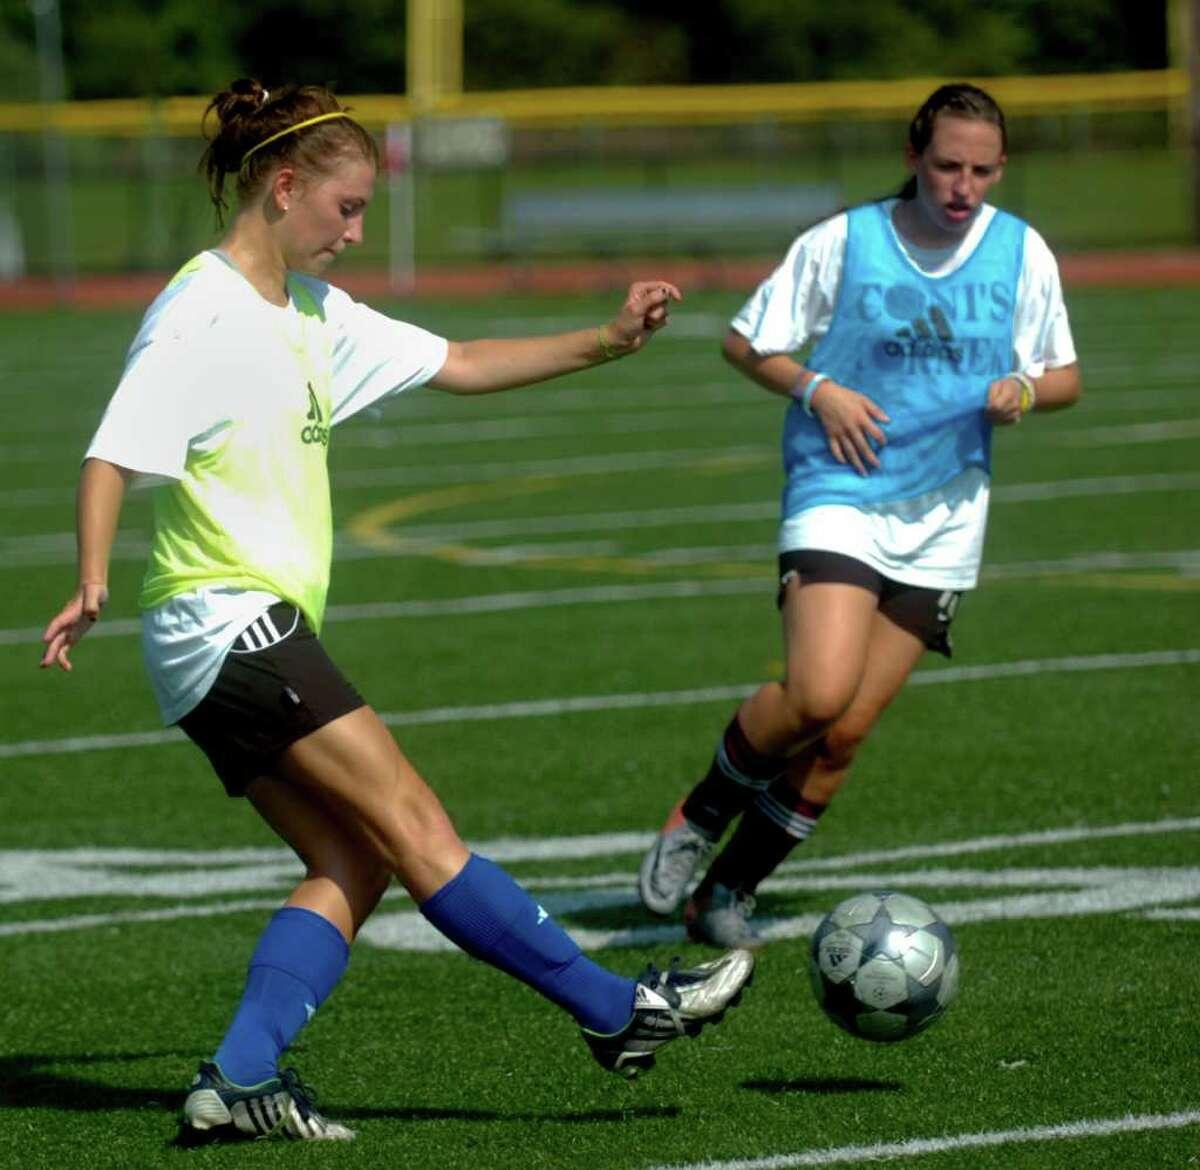 St. Joseph's Katie Dannaher, left, practices on the school's field Thursday, September 2, 2010.